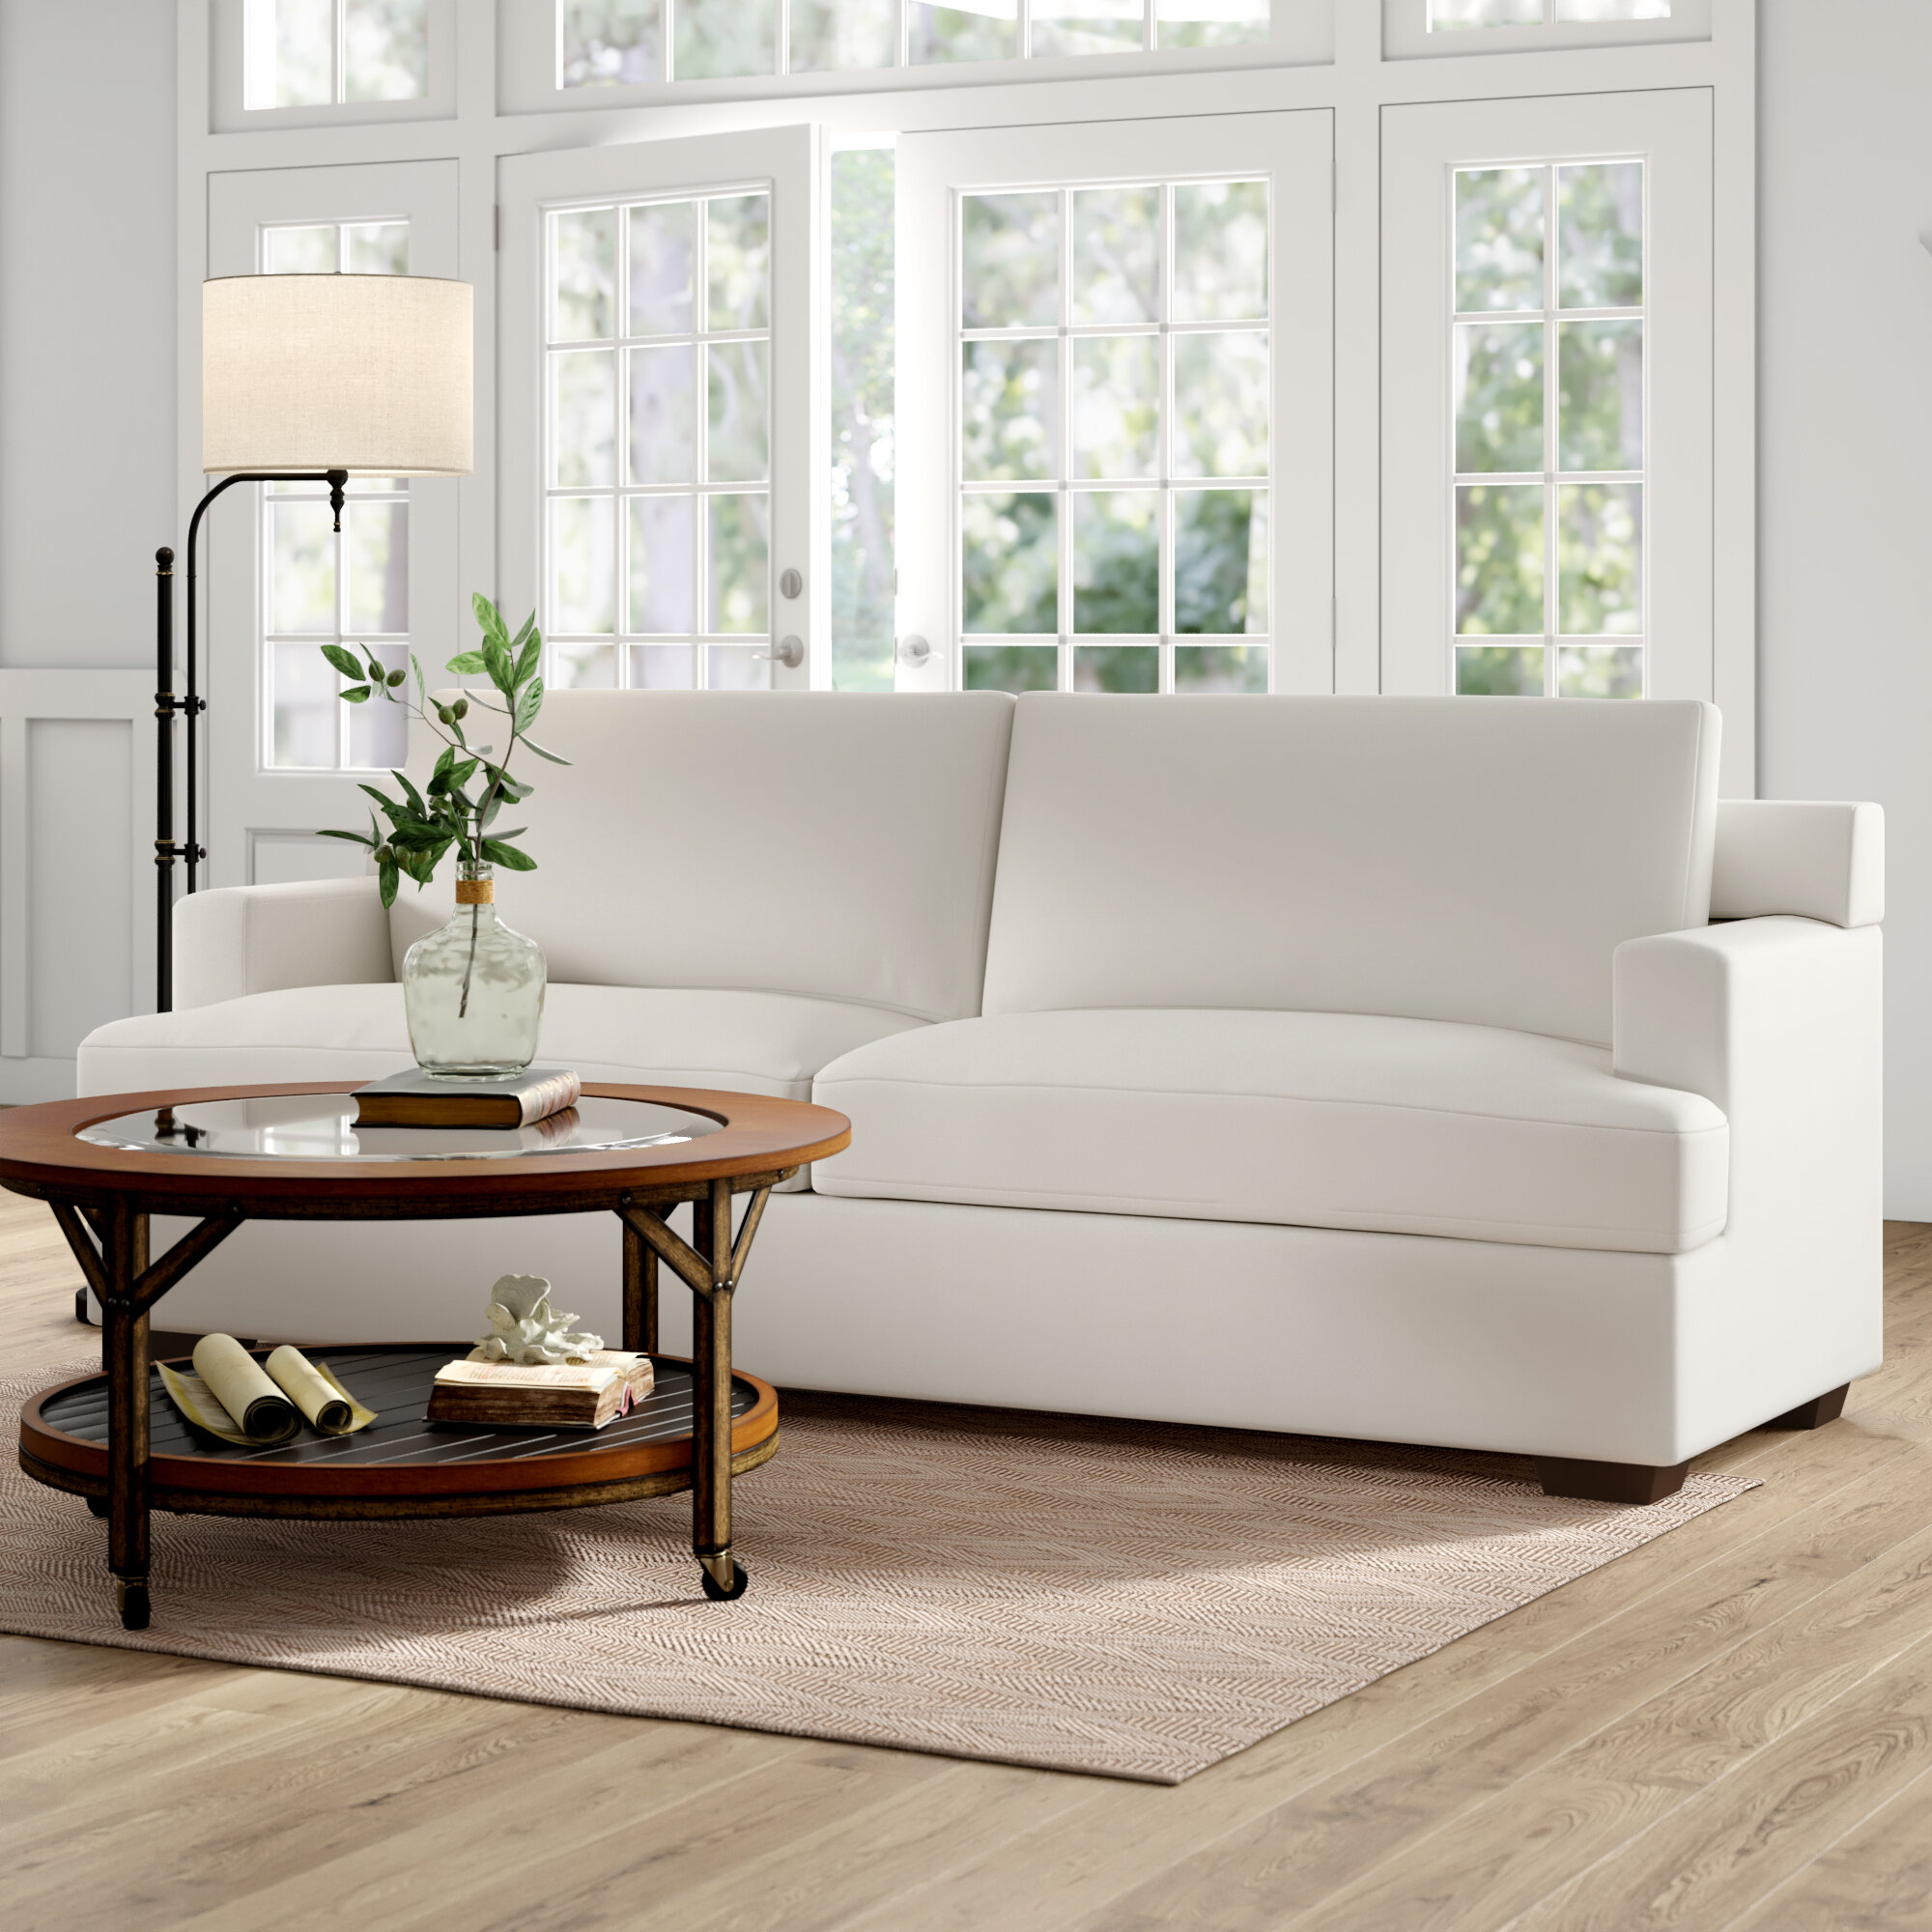 Rustic Sofas You Ll Love In 2020 Wayfair